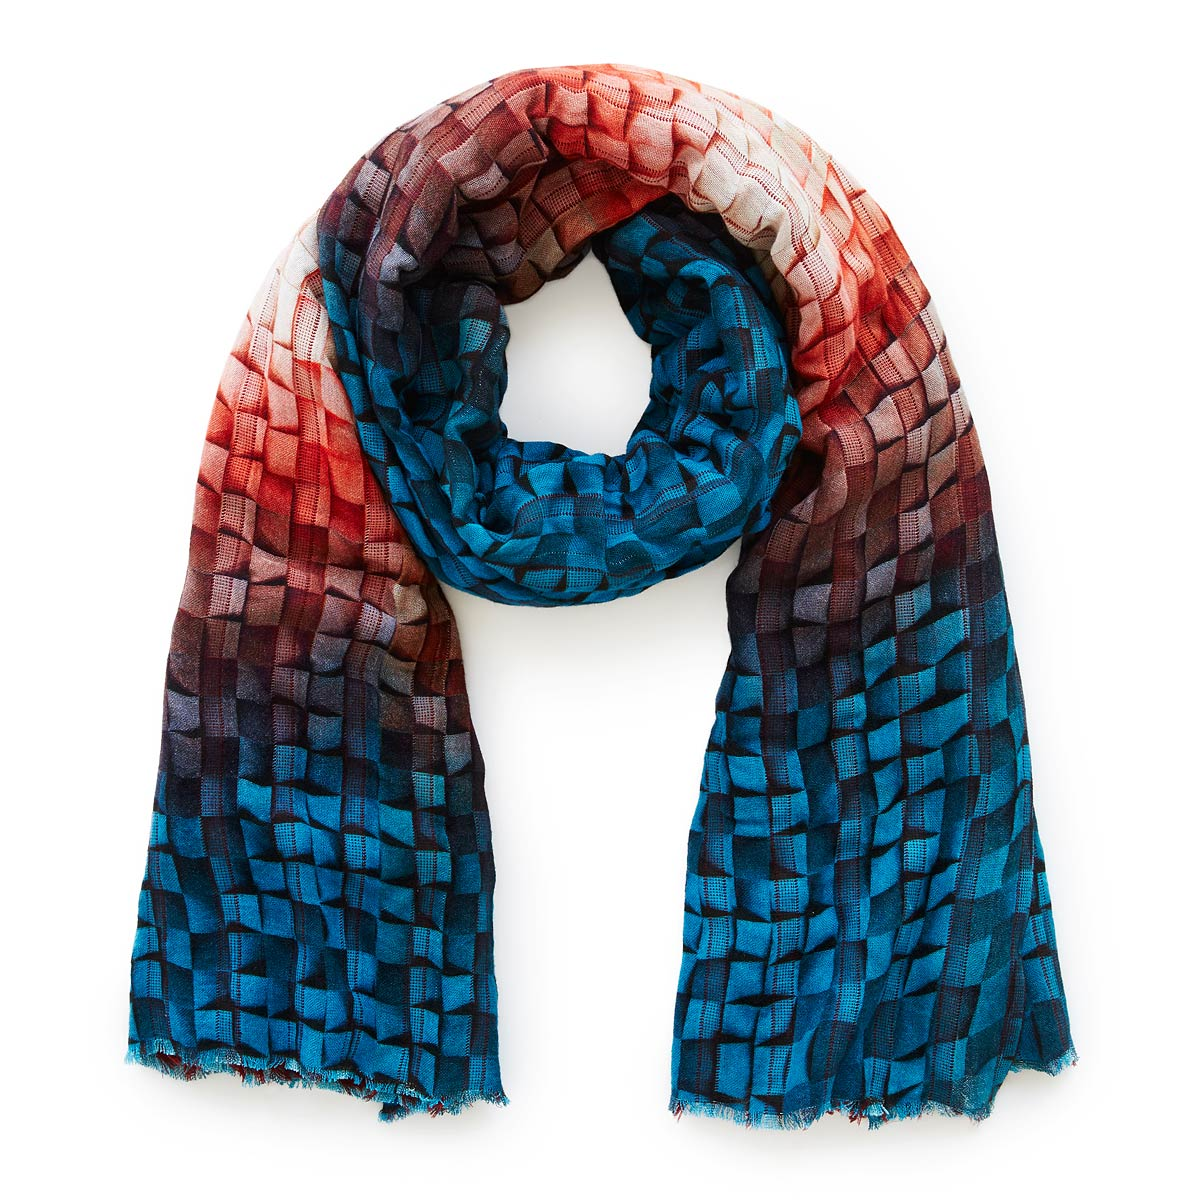 53a839ee0572c Mosaic Painting Reversible Scarf | digital print, artisan woven ...